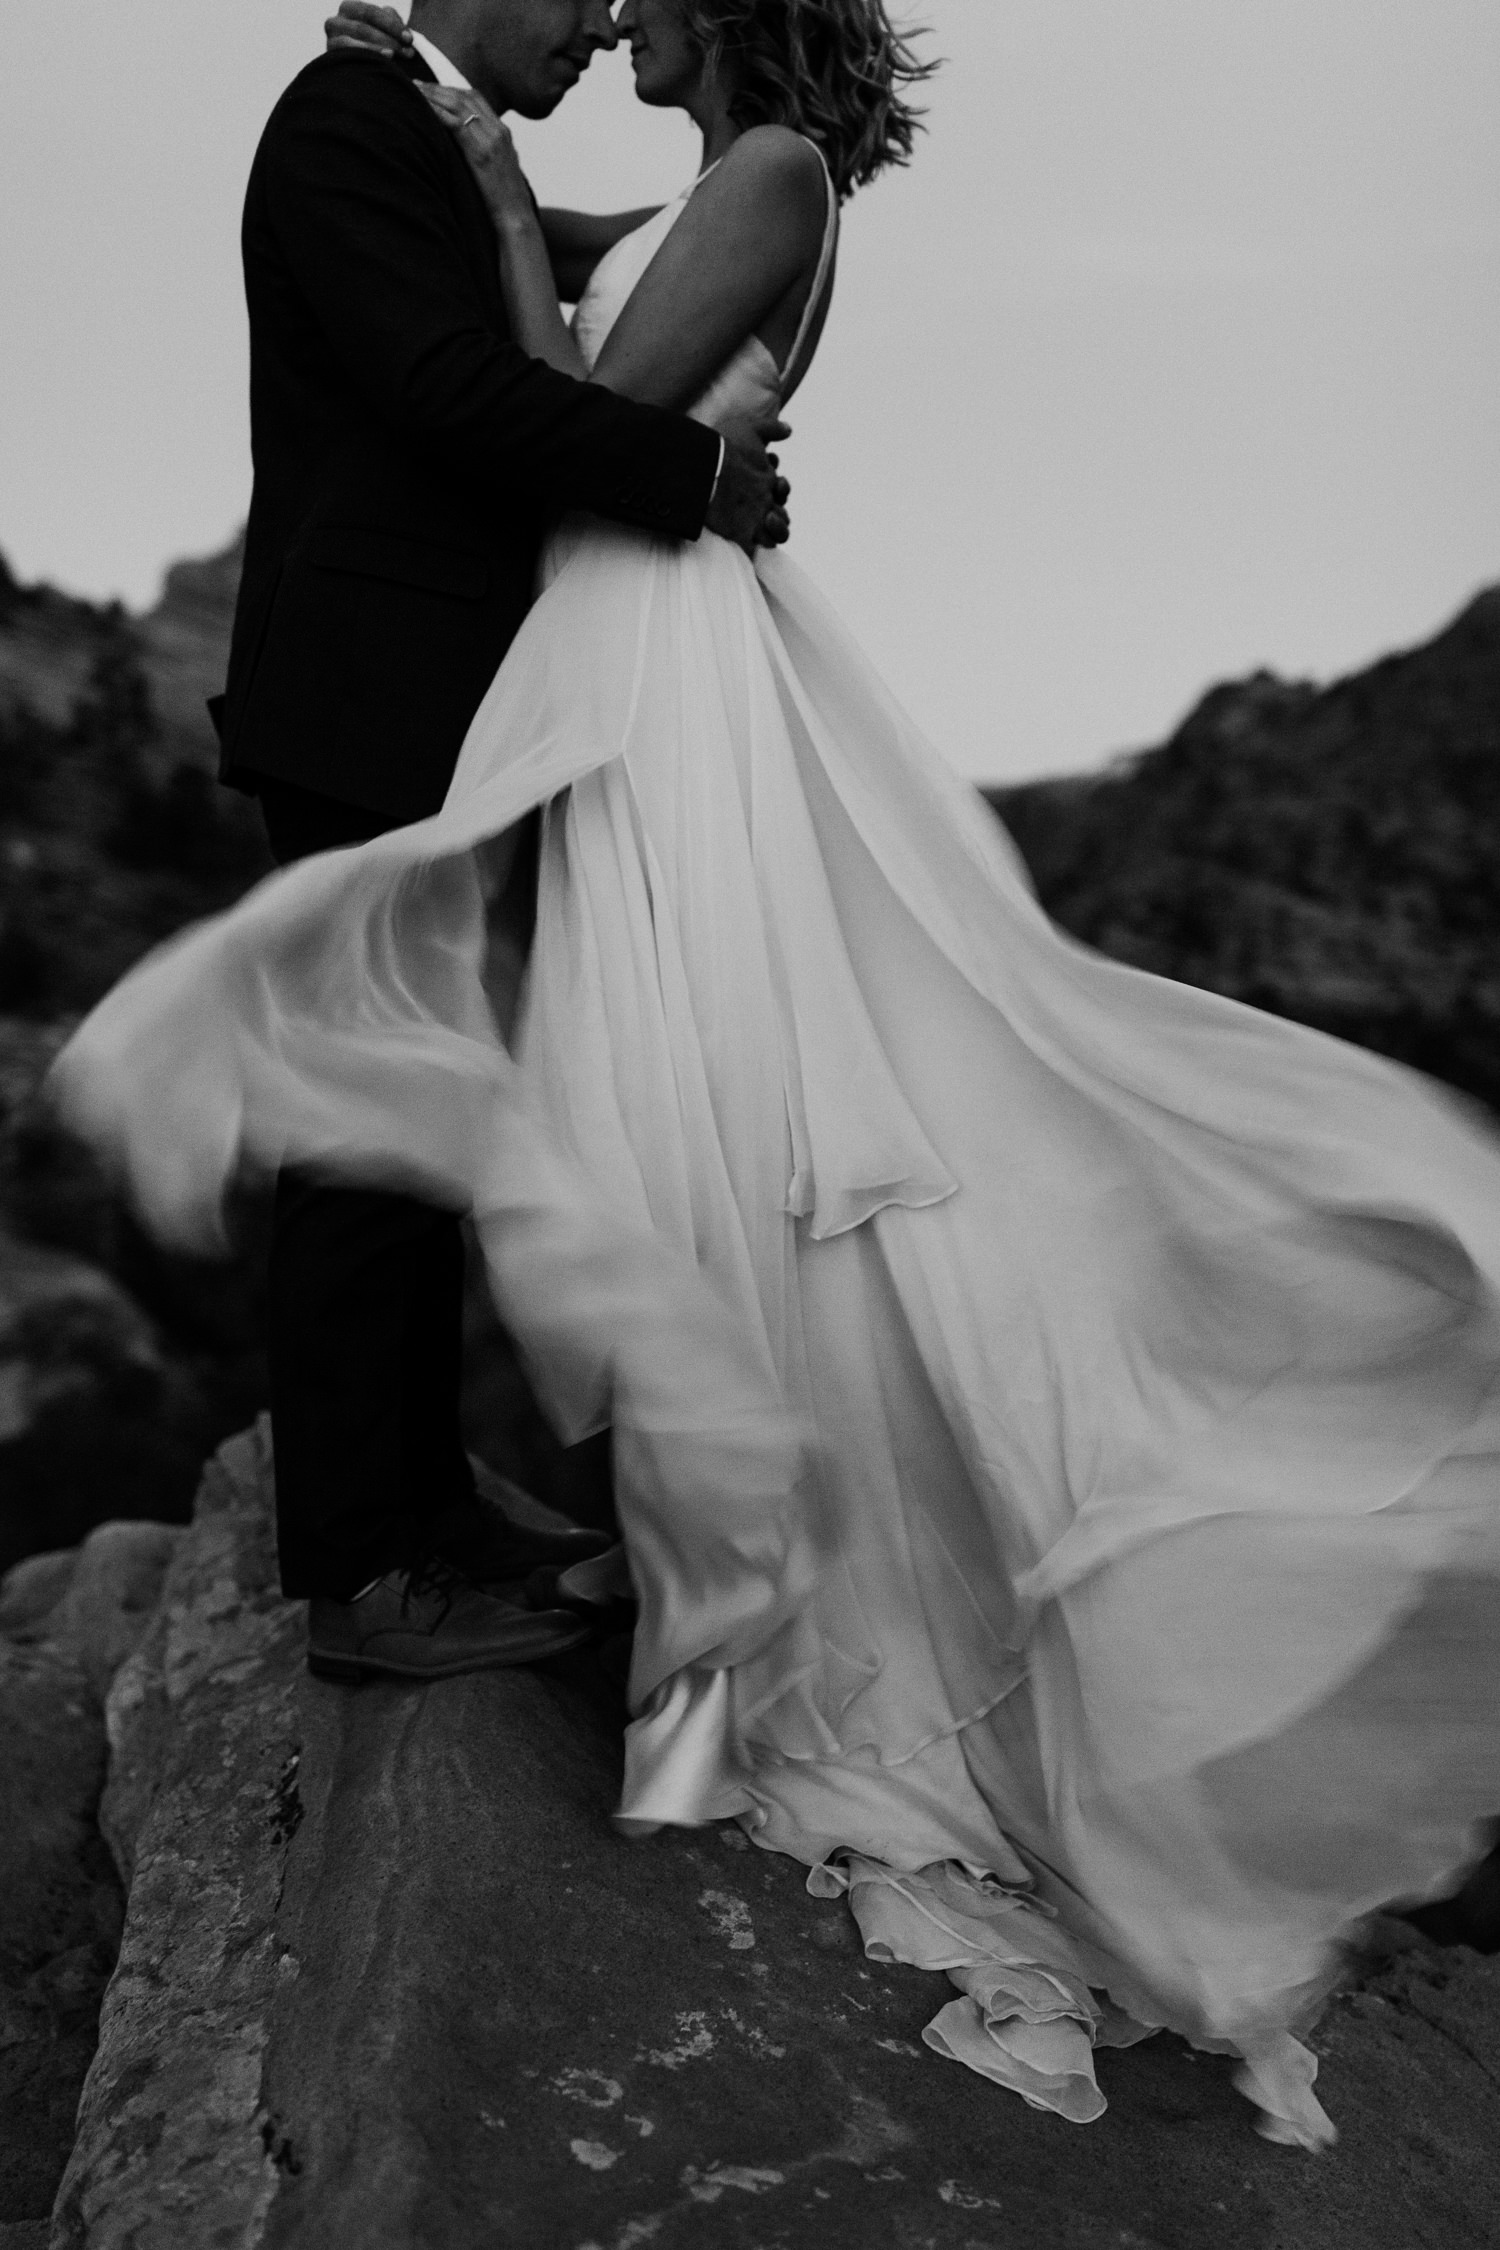 zion-national-park-wedding-144.jpg